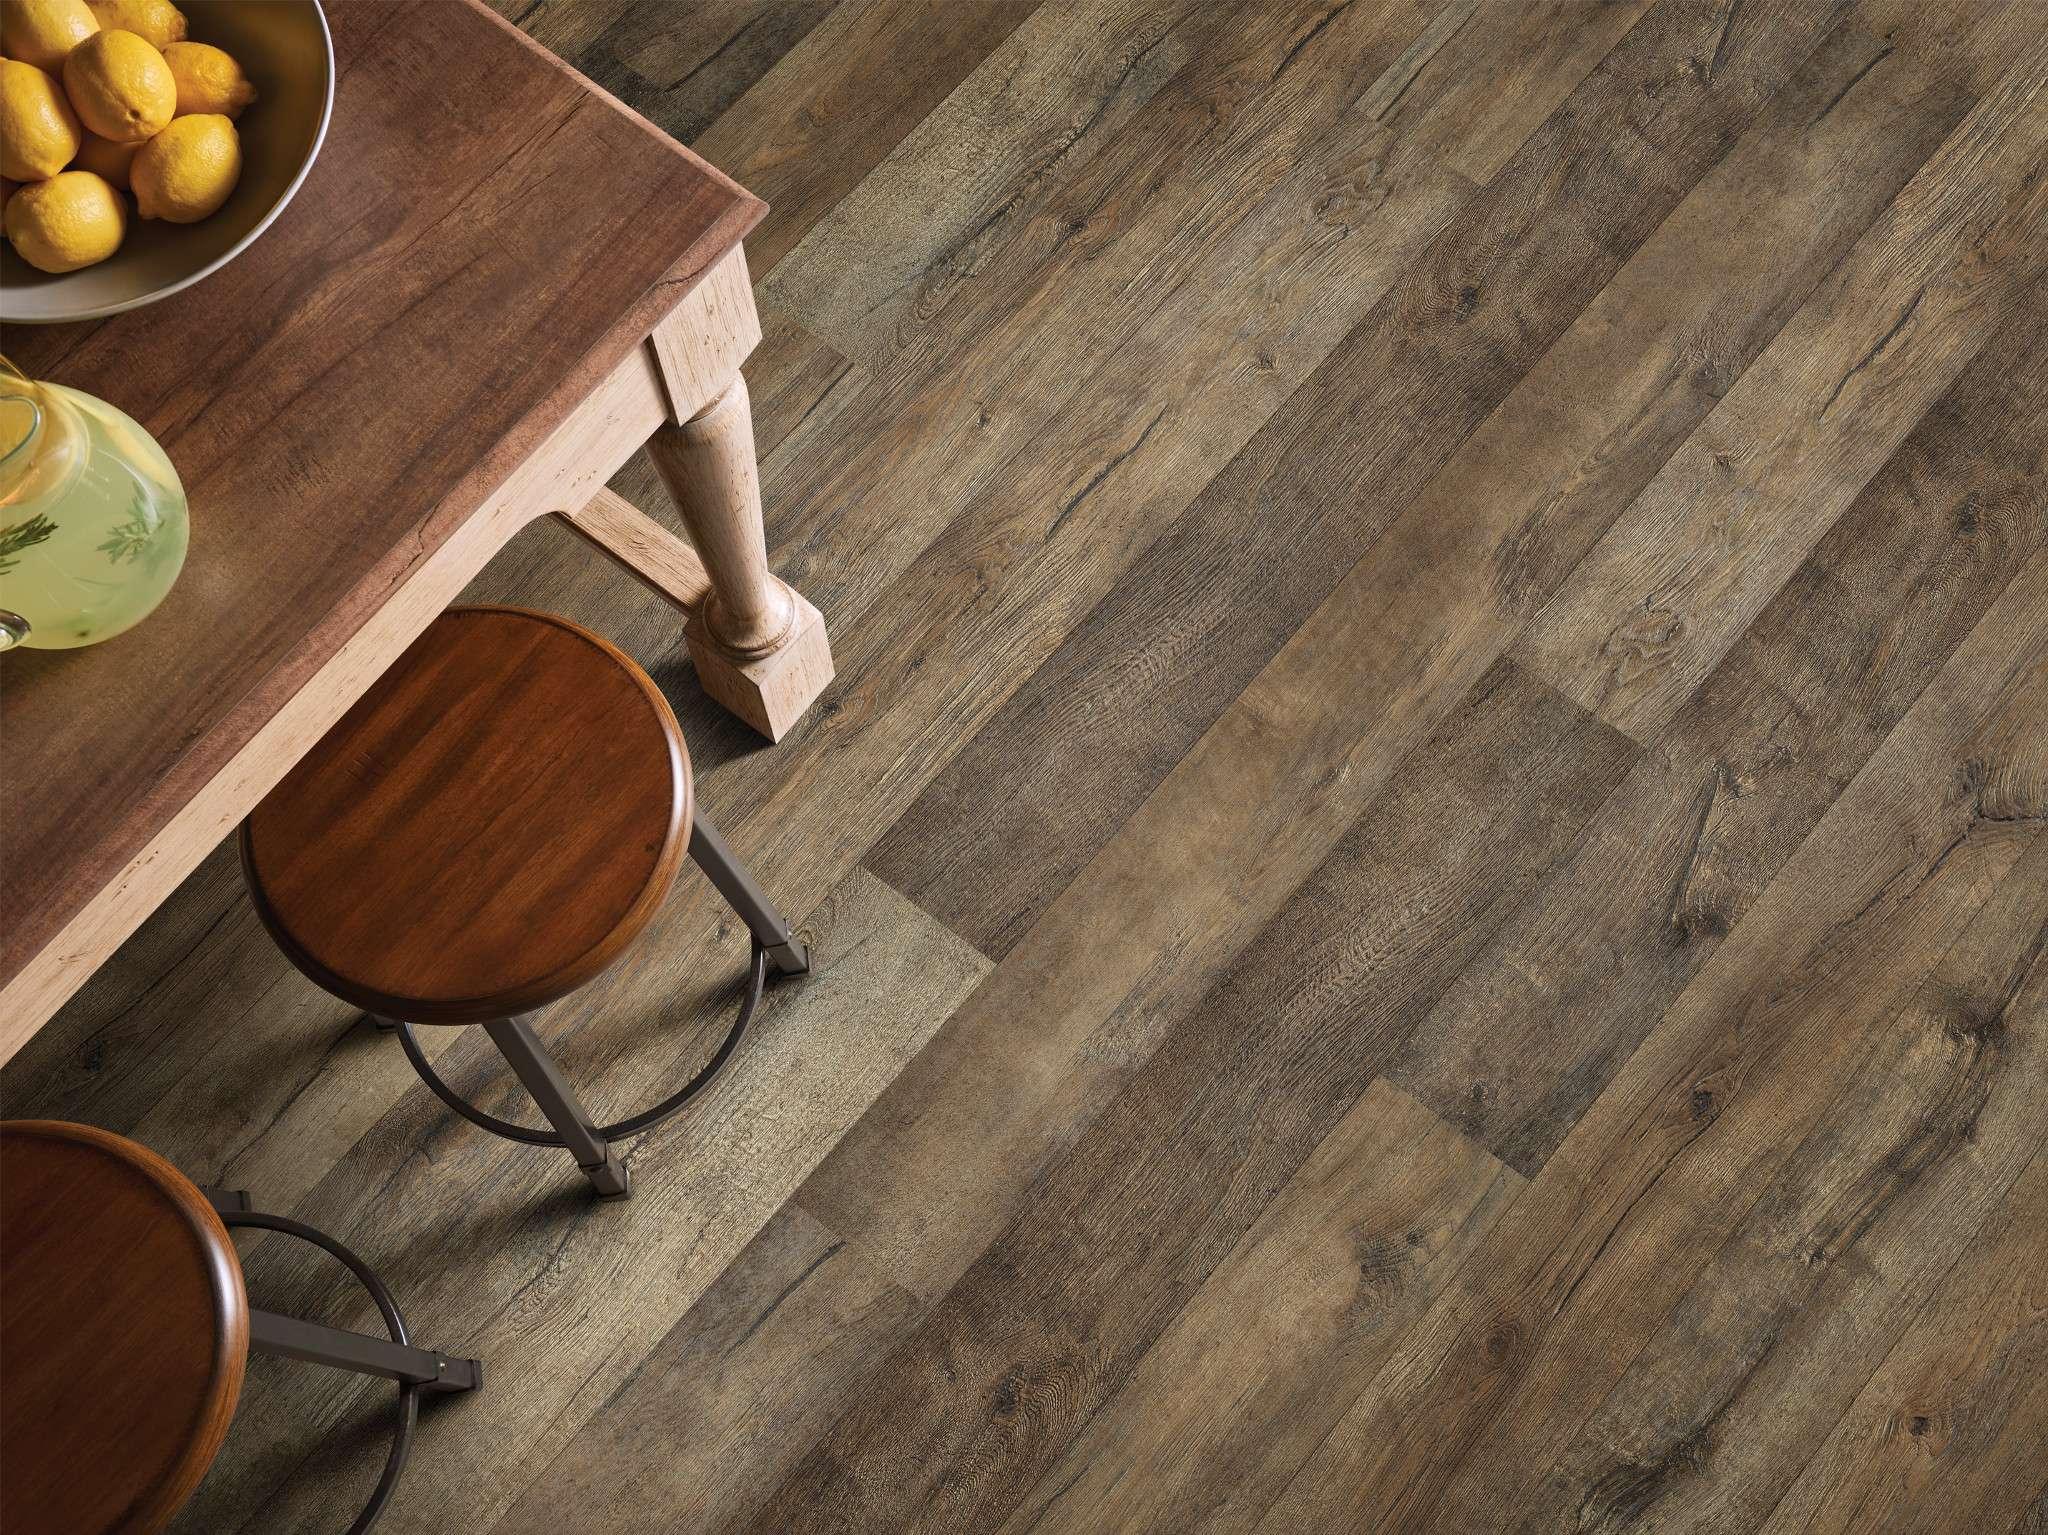 Grand Vista Sl415 Township Laminates, Shaw Tile Look Laminate Flooring